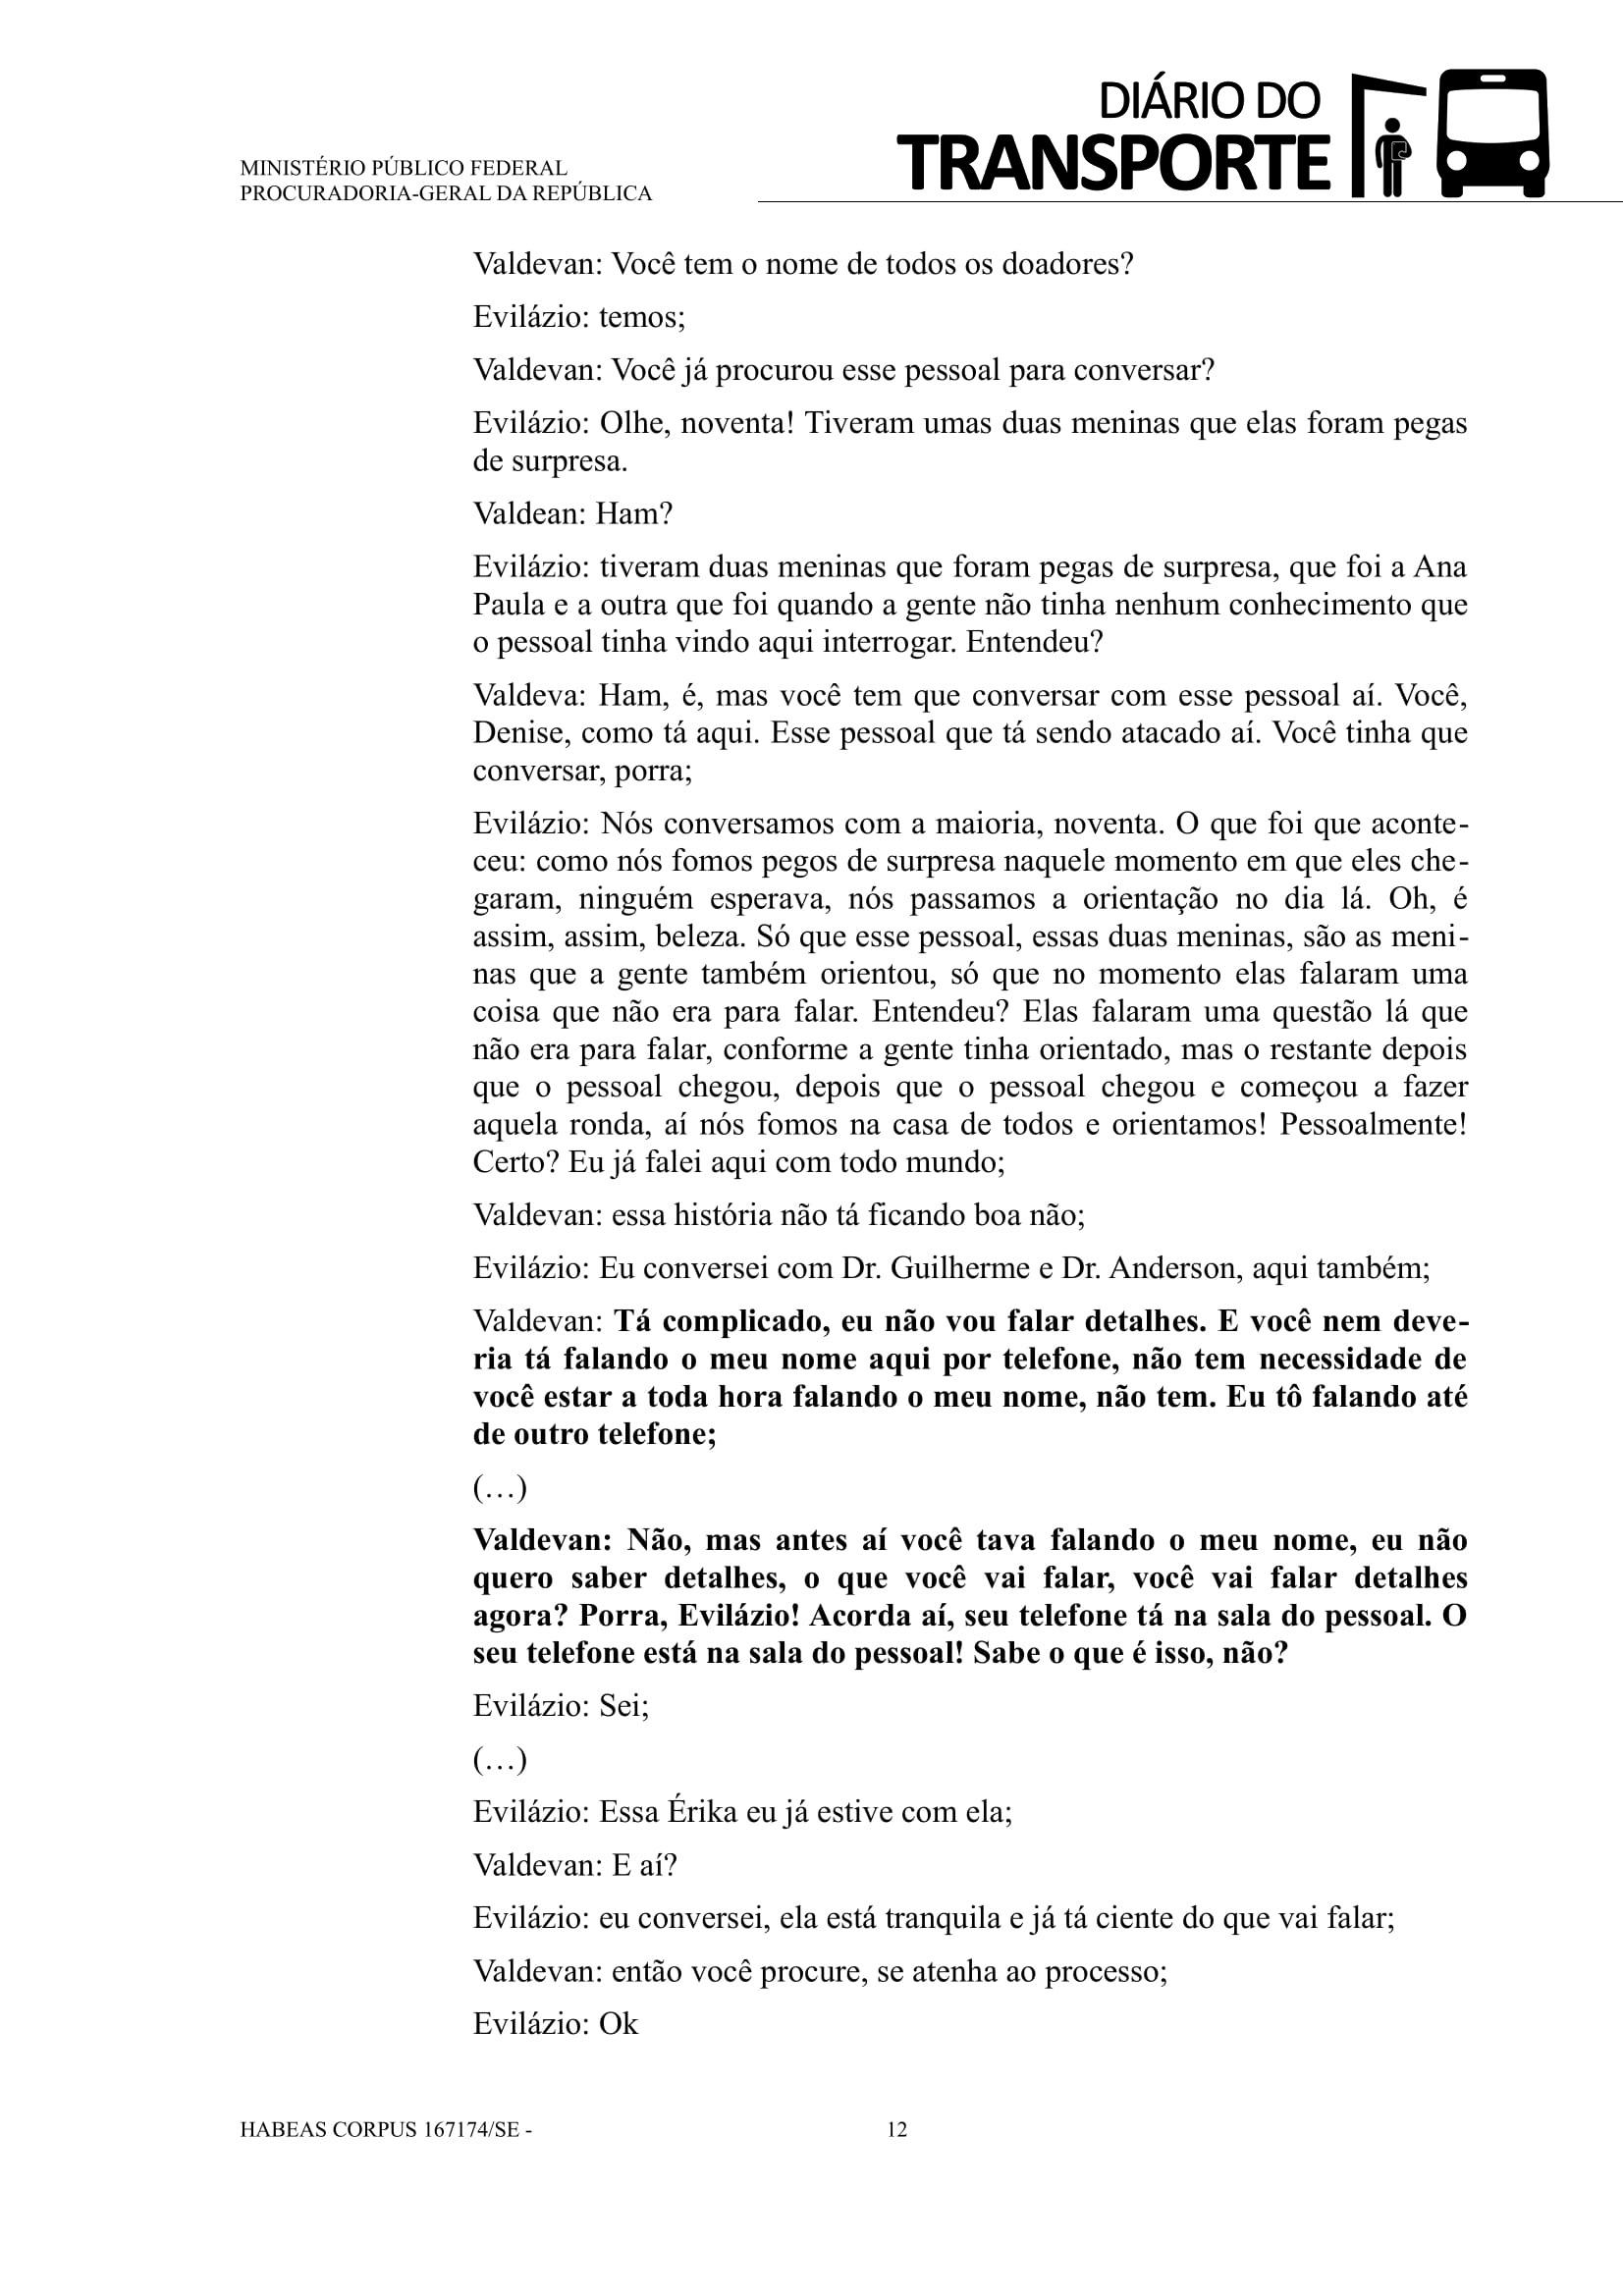 HC 167174_ContrarrazoesAgravo_Jose Valdevan de Jesus Santos-12